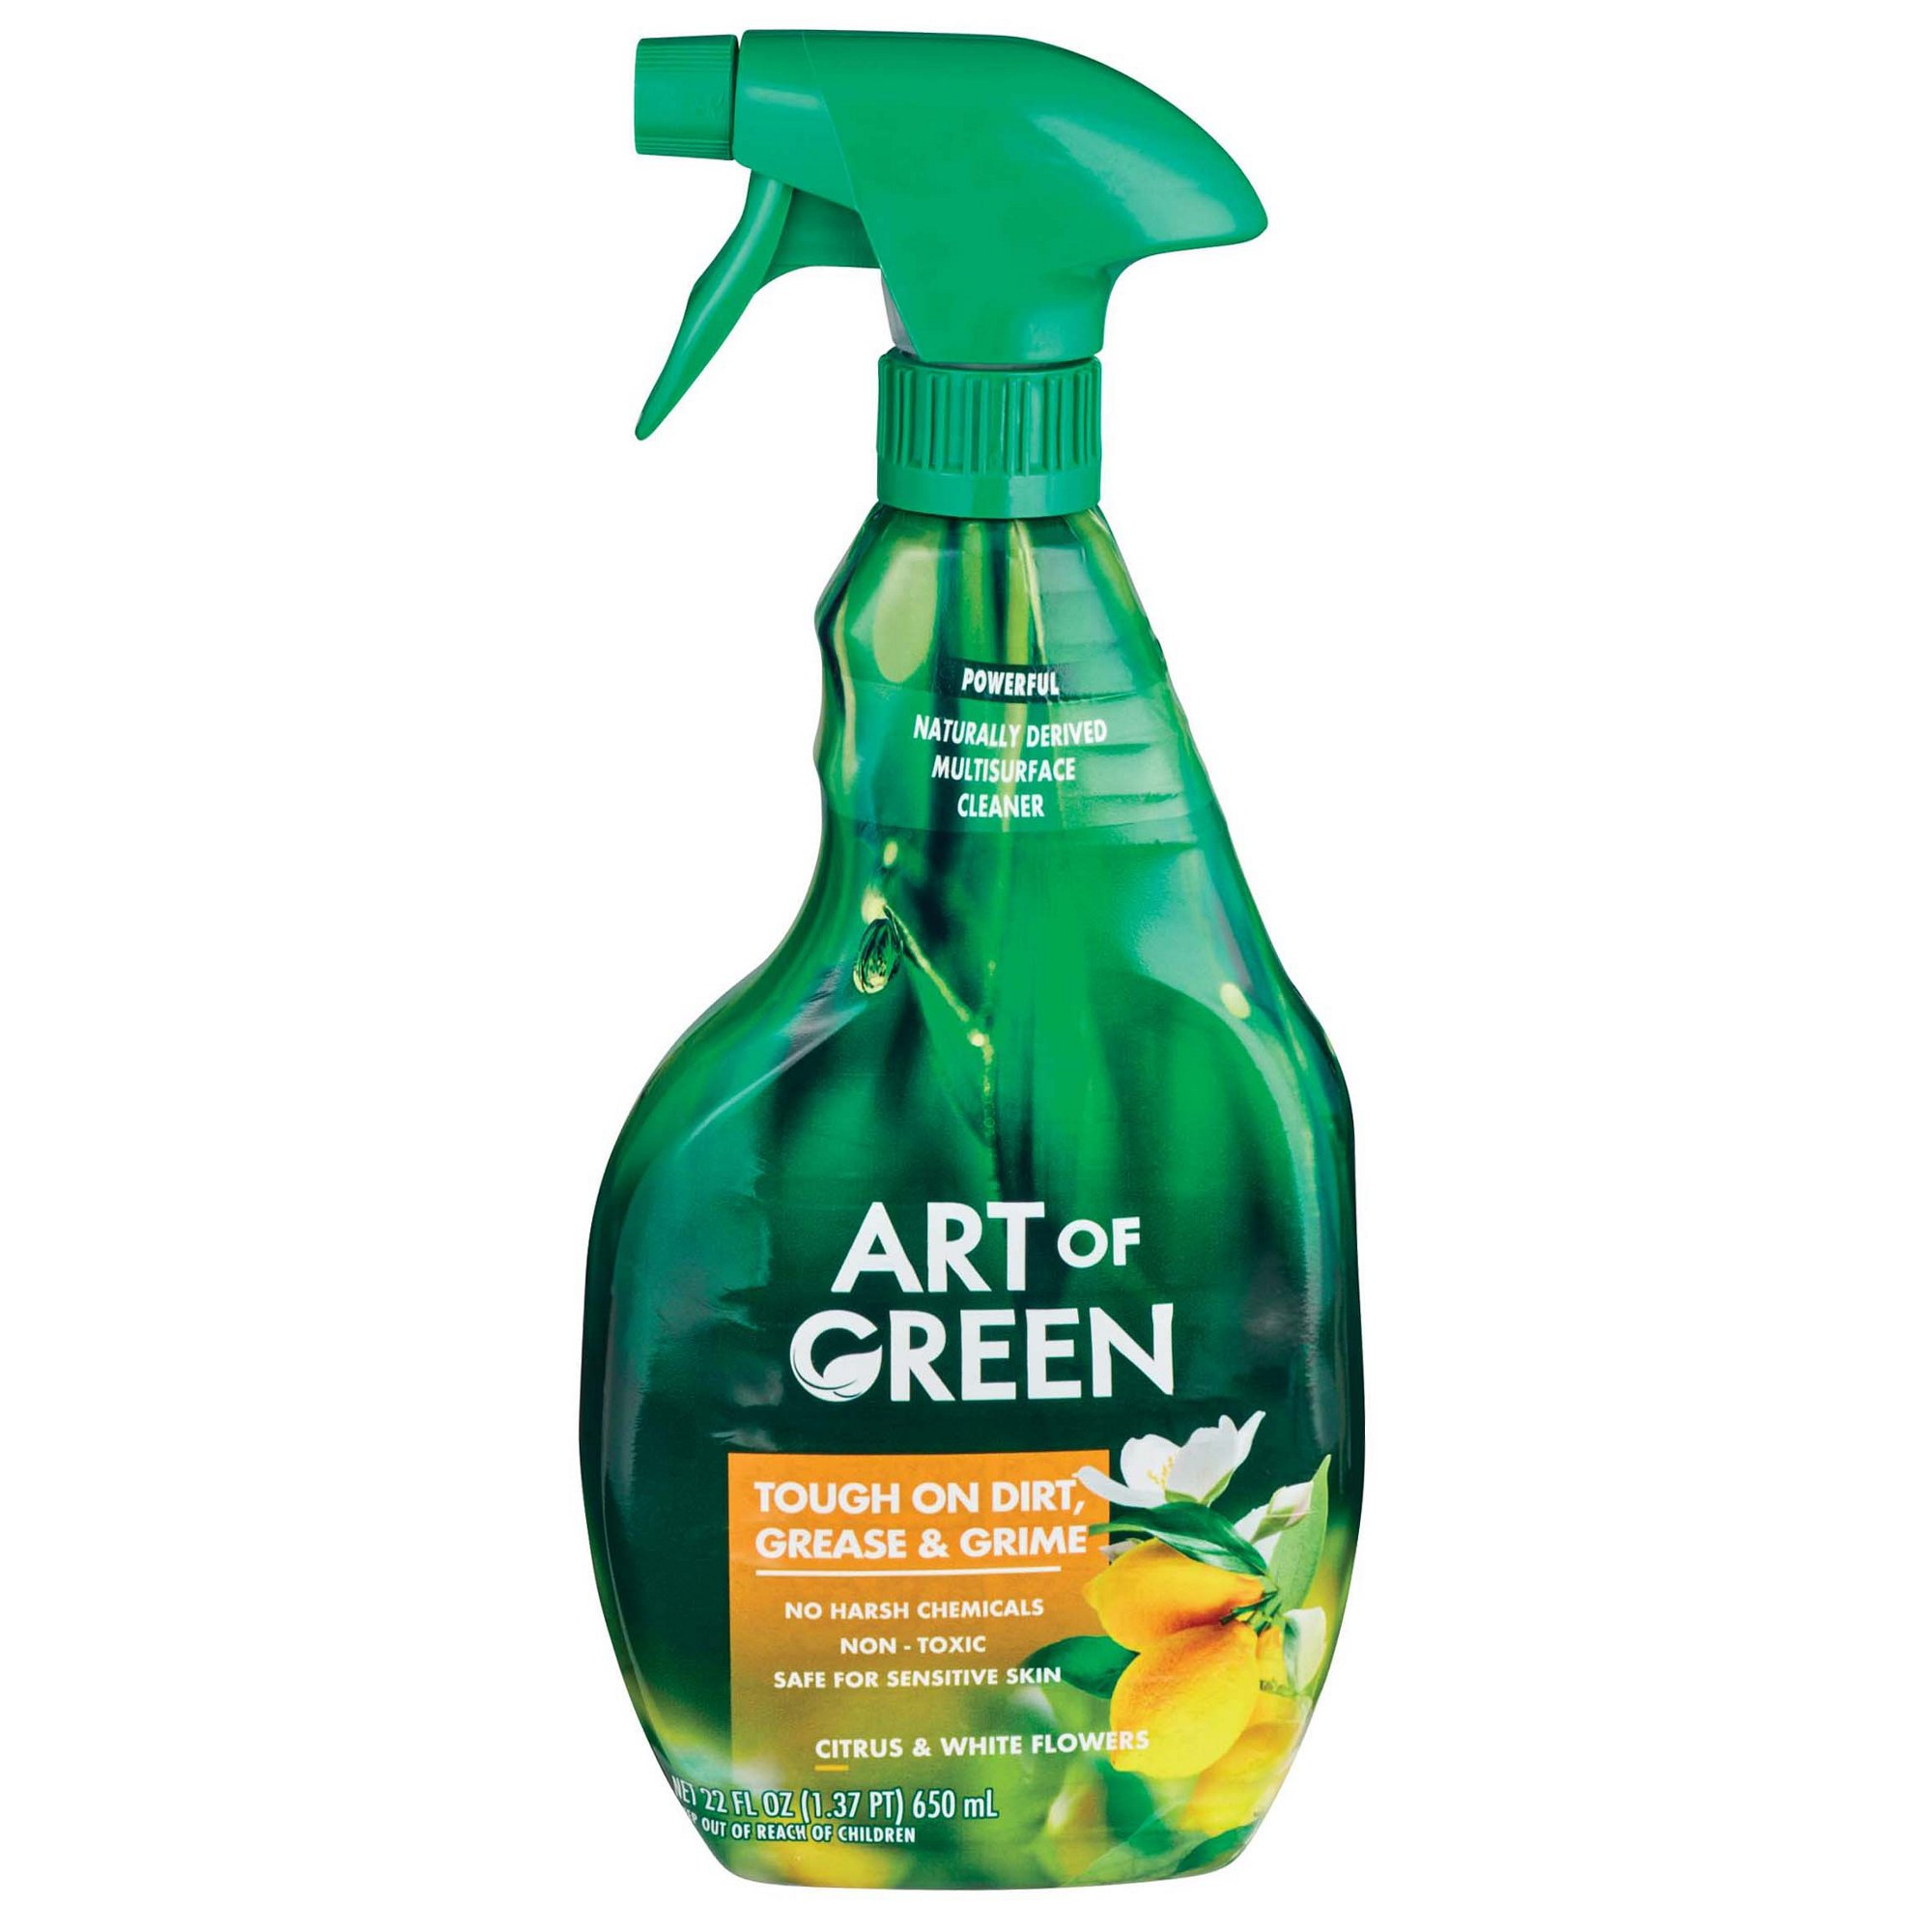 Art of Green Citrus & White Flowers Multi Purpose Cleaner Spray